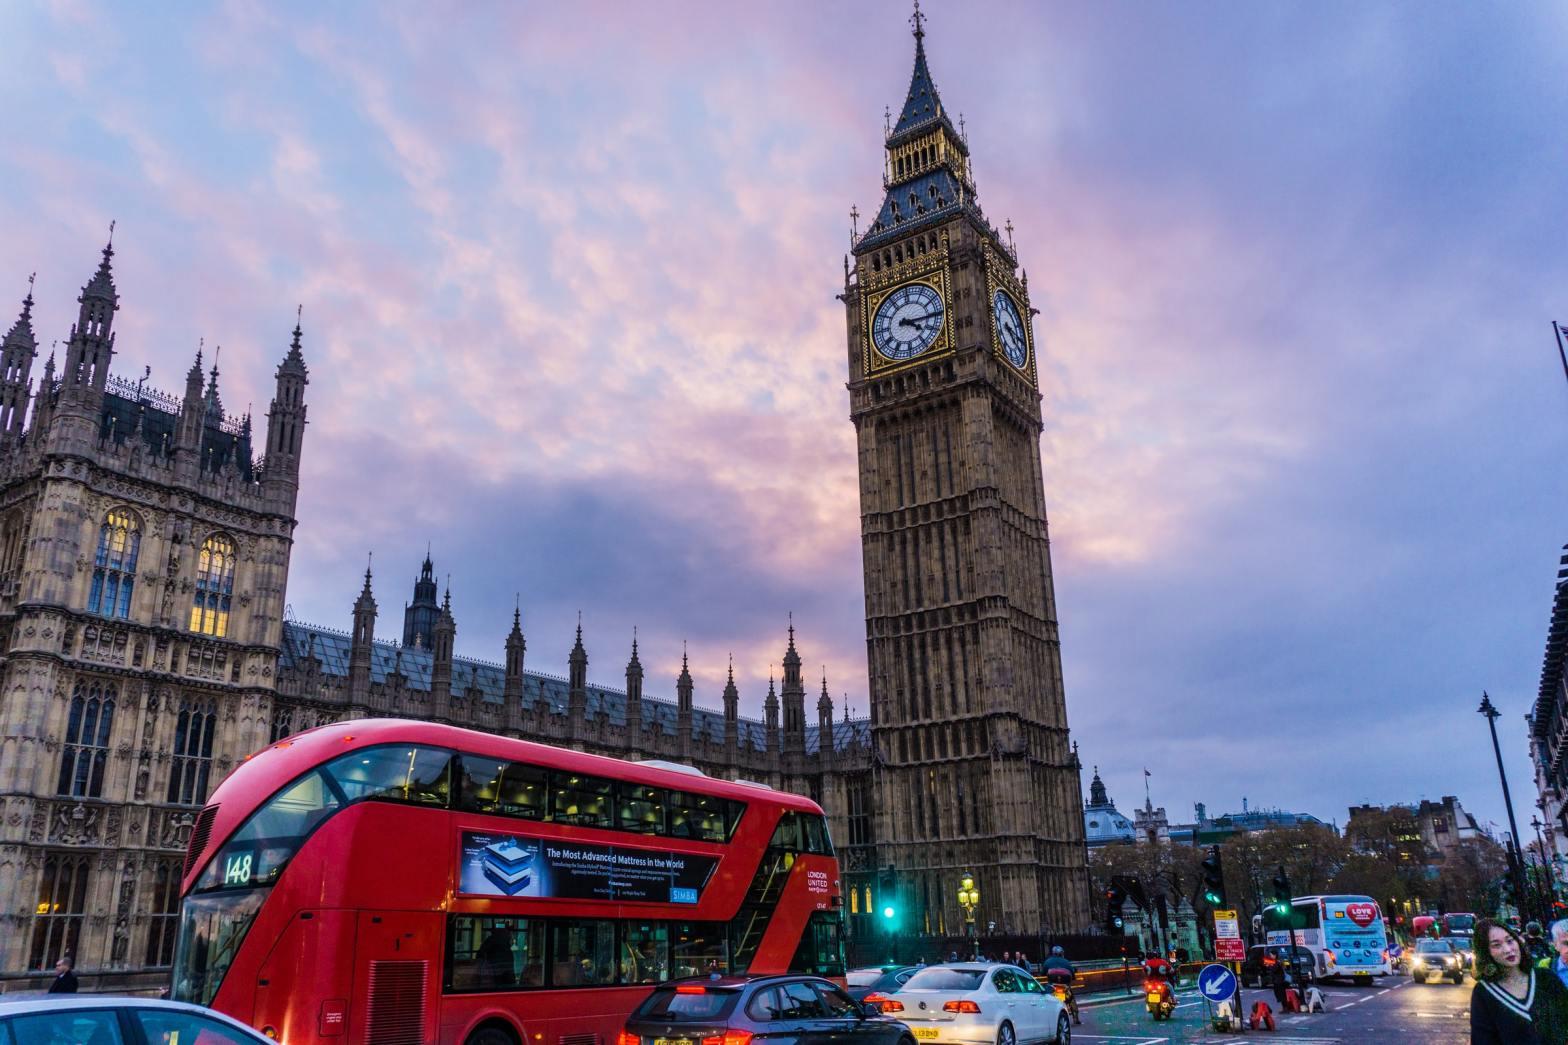 Bus crossing the Big Ben in London